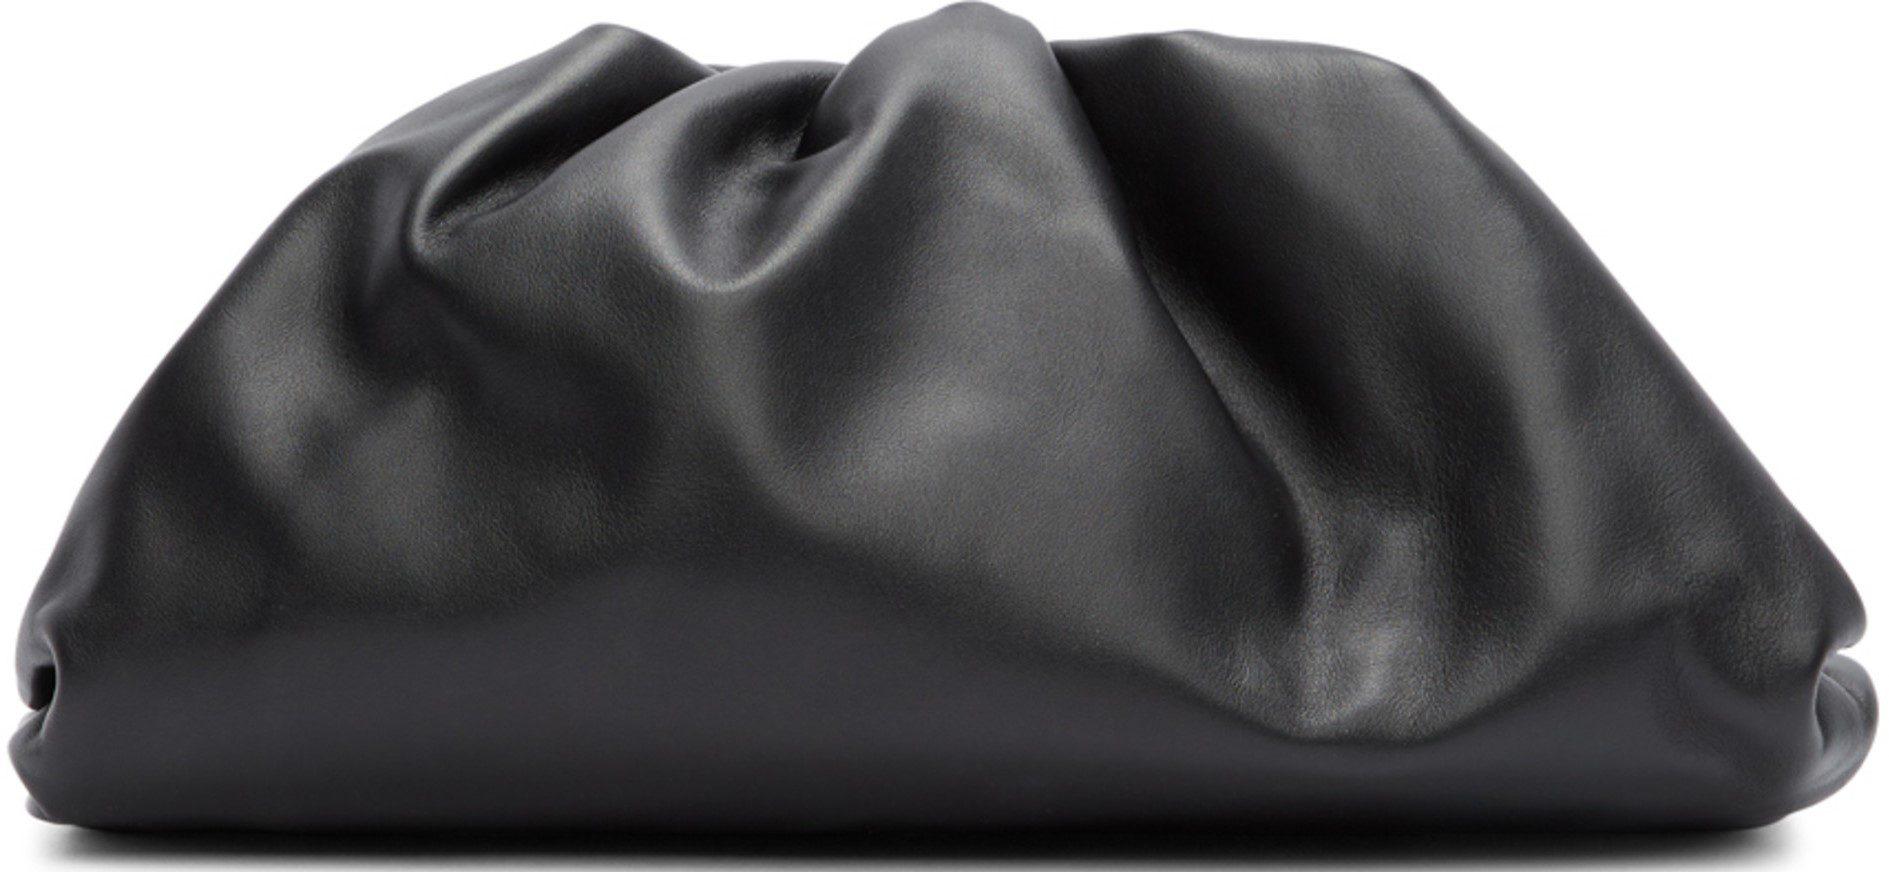 Black The Pouch Clutch-Bottega Veneta